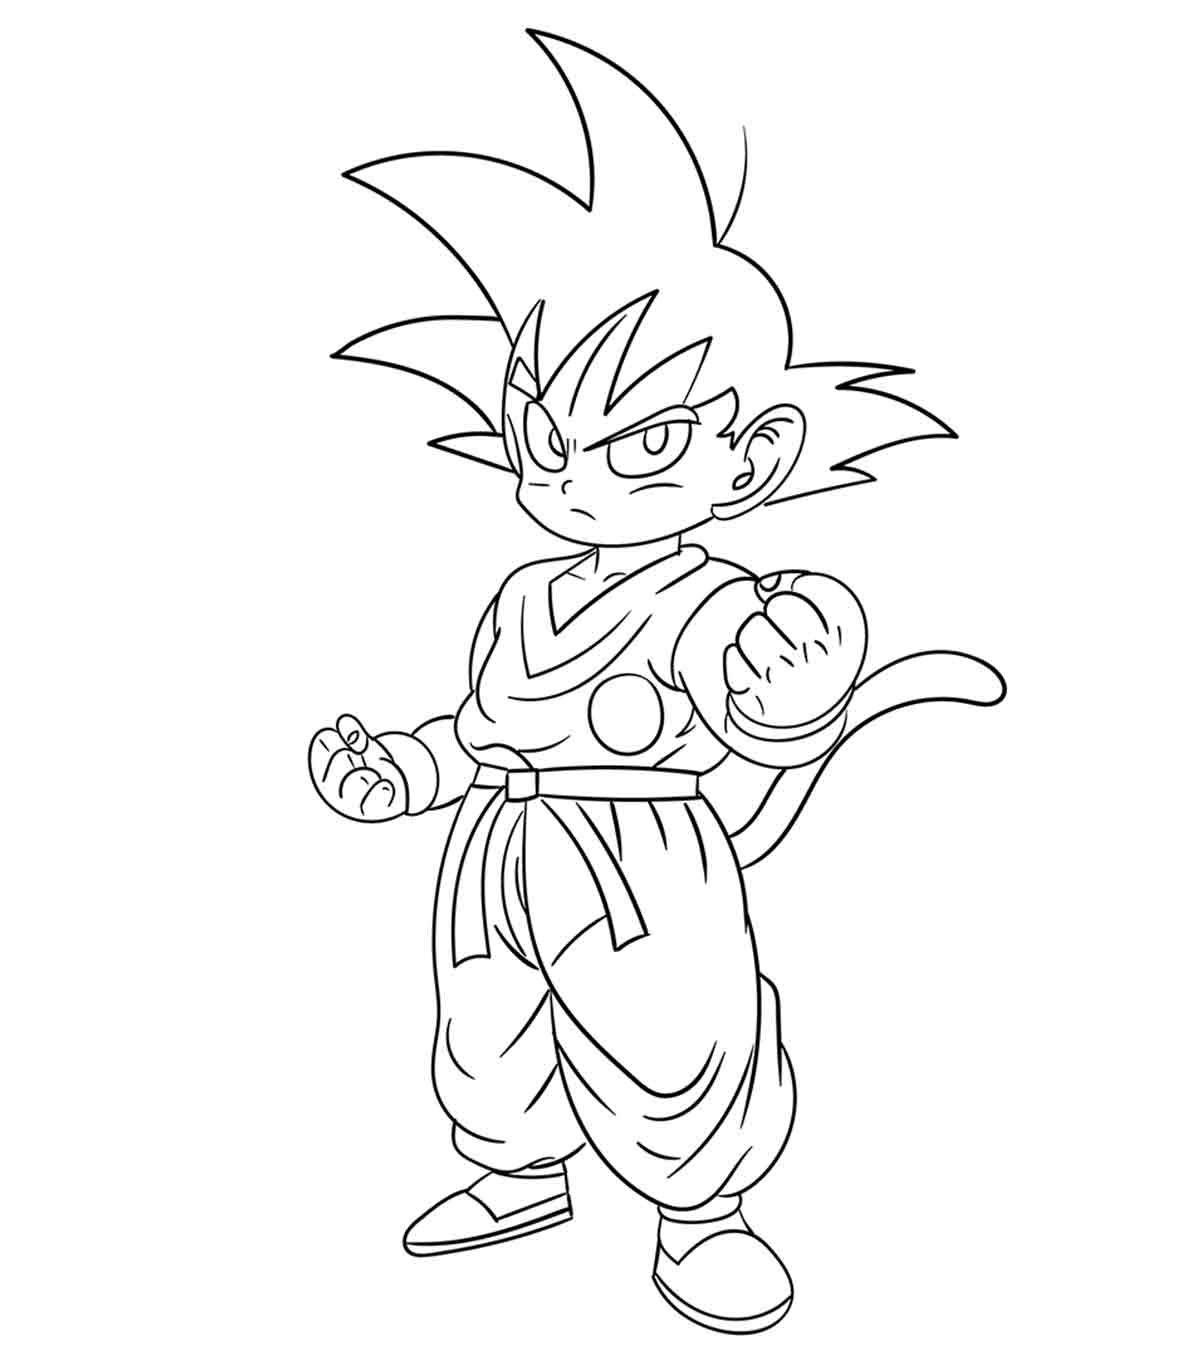 Dragon Ball Z Coloring Pages Goku Gambar Manga